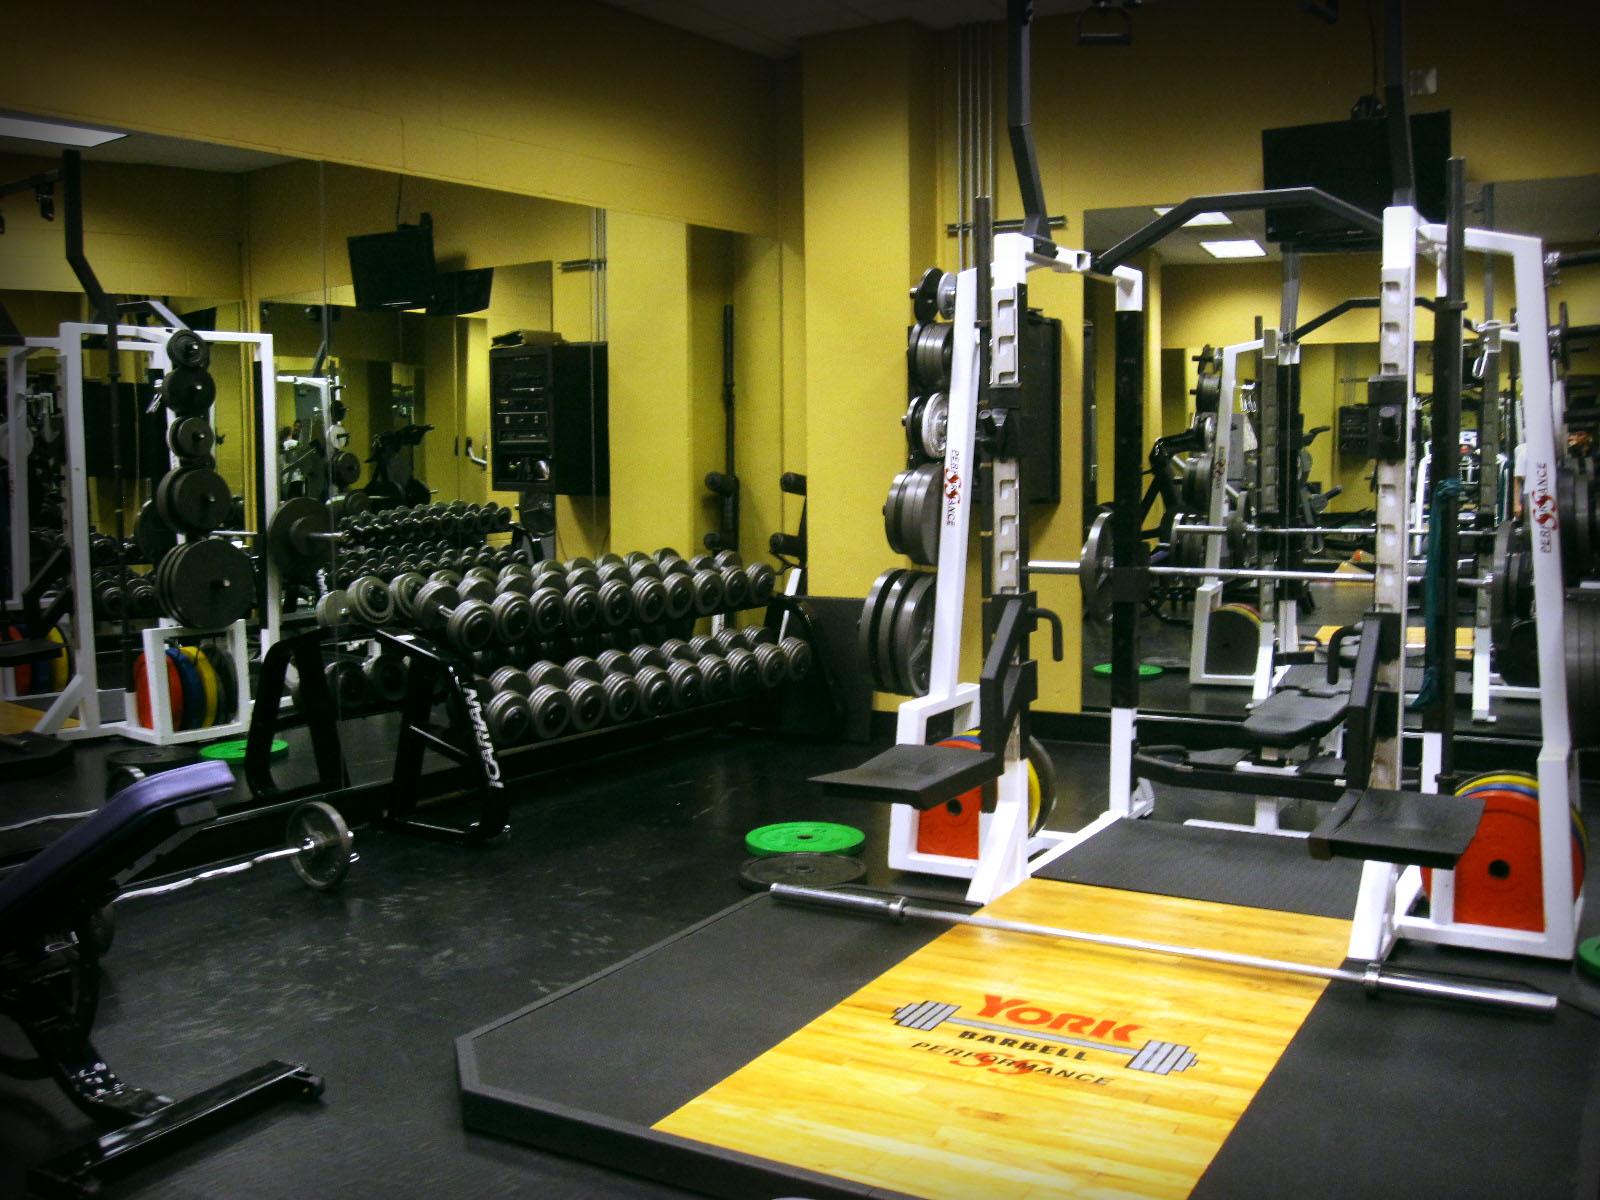 Weight Room Wallpaper Wallpapersafari